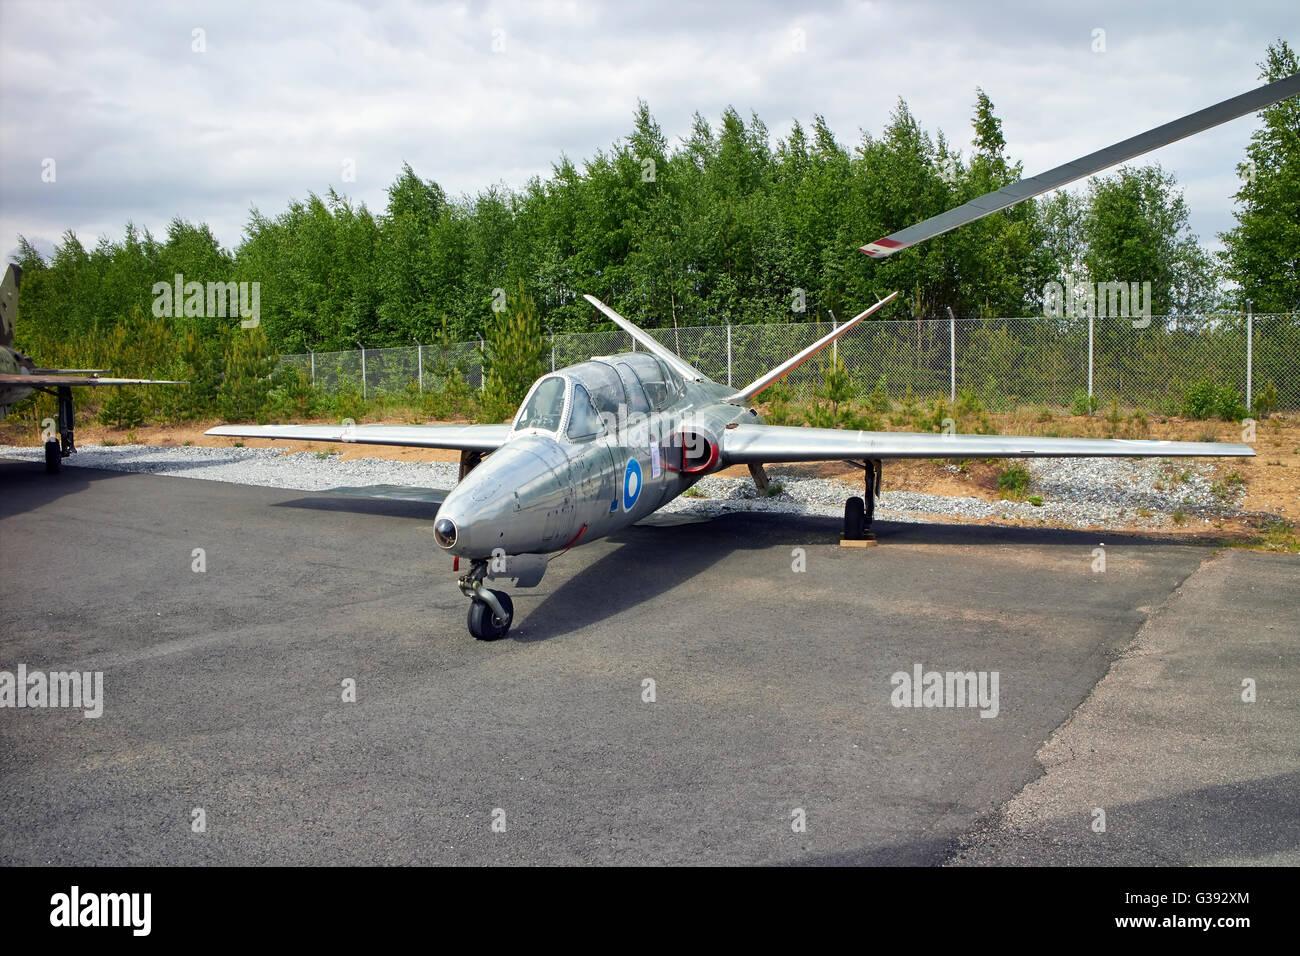 Fouga CM-170 Magister on display, Finland - Stock Image